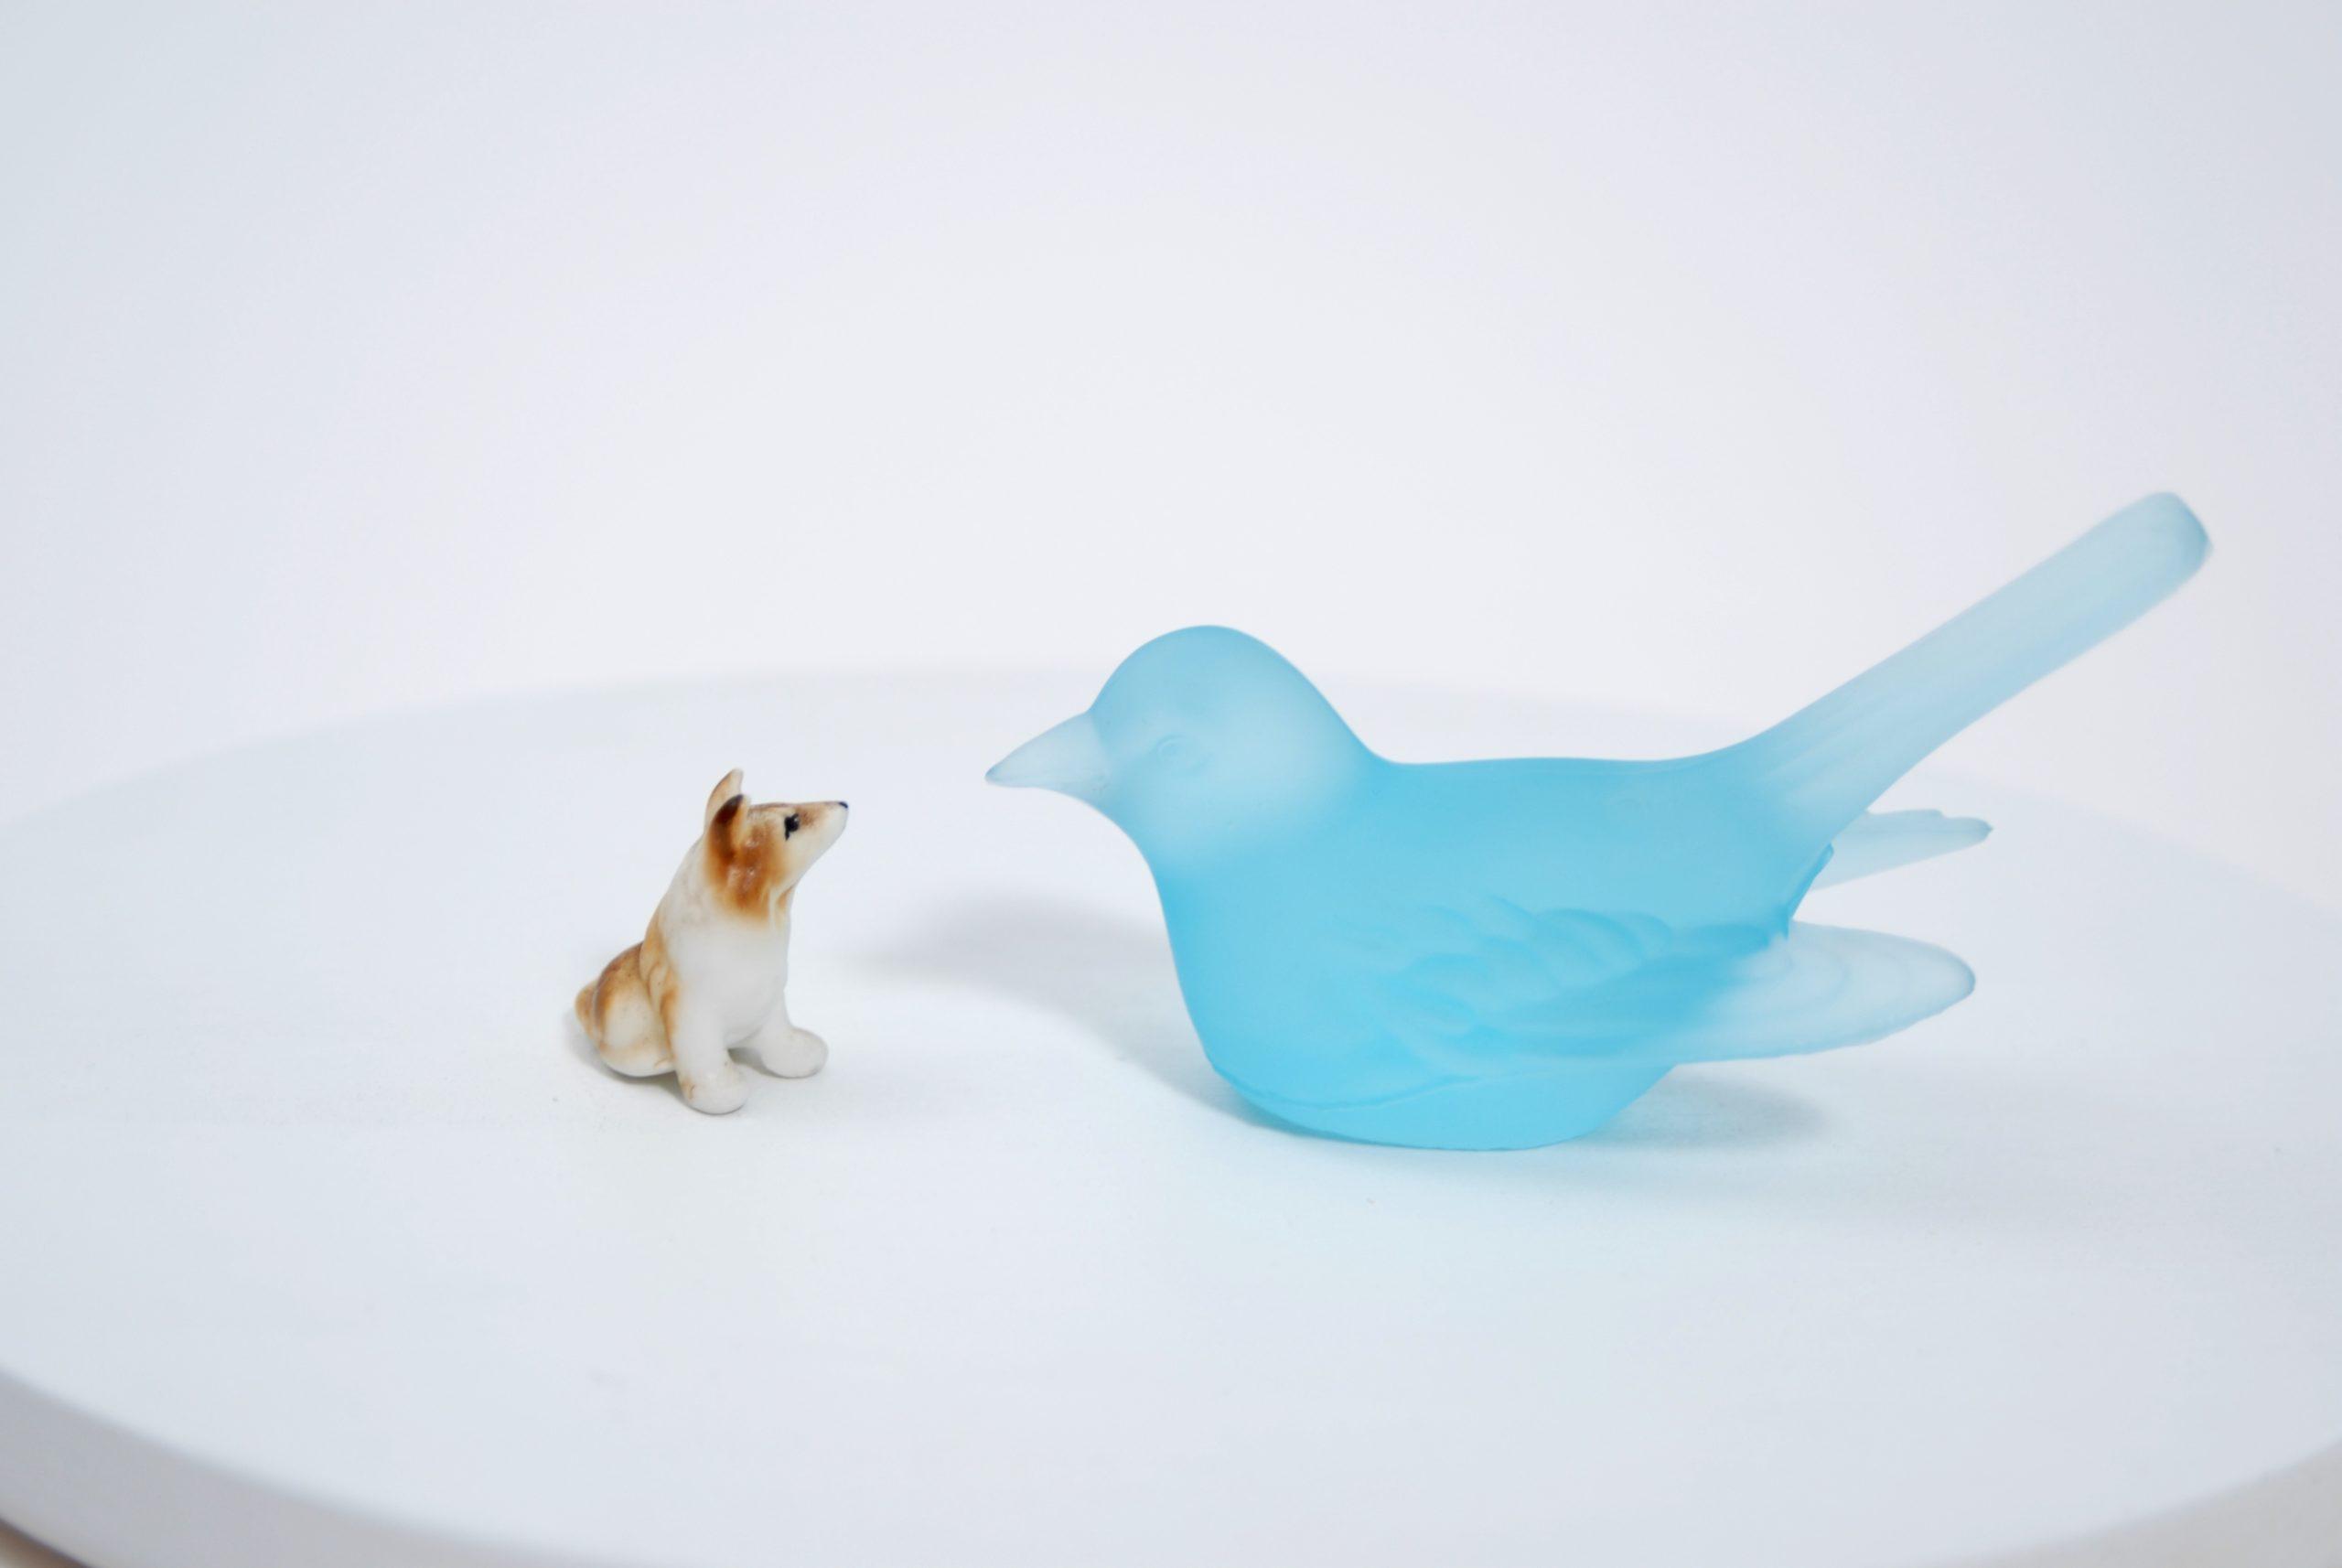 """Dialogue (with blue bird)"" 2007, tecnica mista"